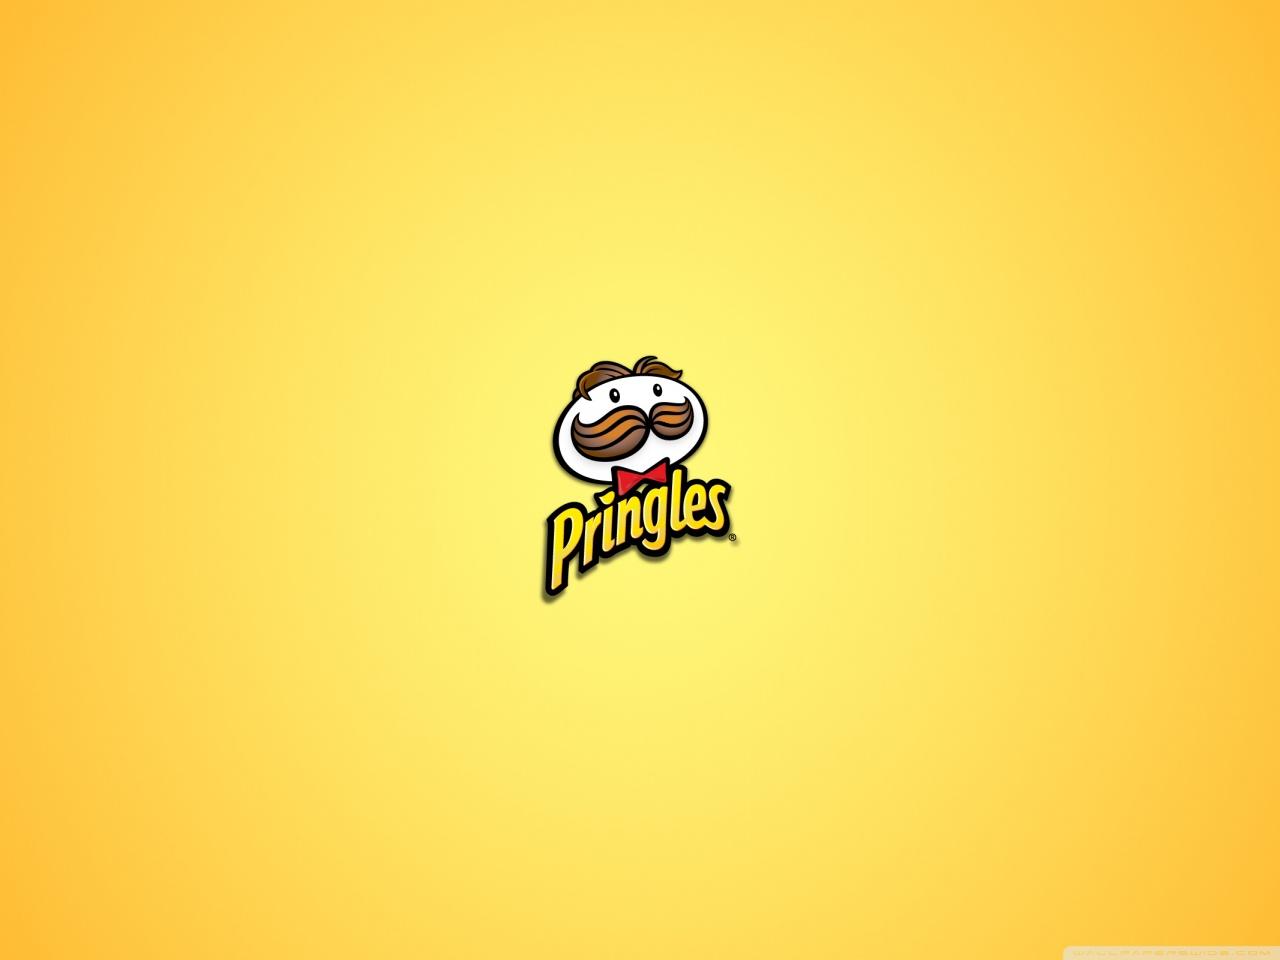 Pringles Guy 4K HD Desktop Wallpaper for 4K Ultra HD TV Dual 1280x960